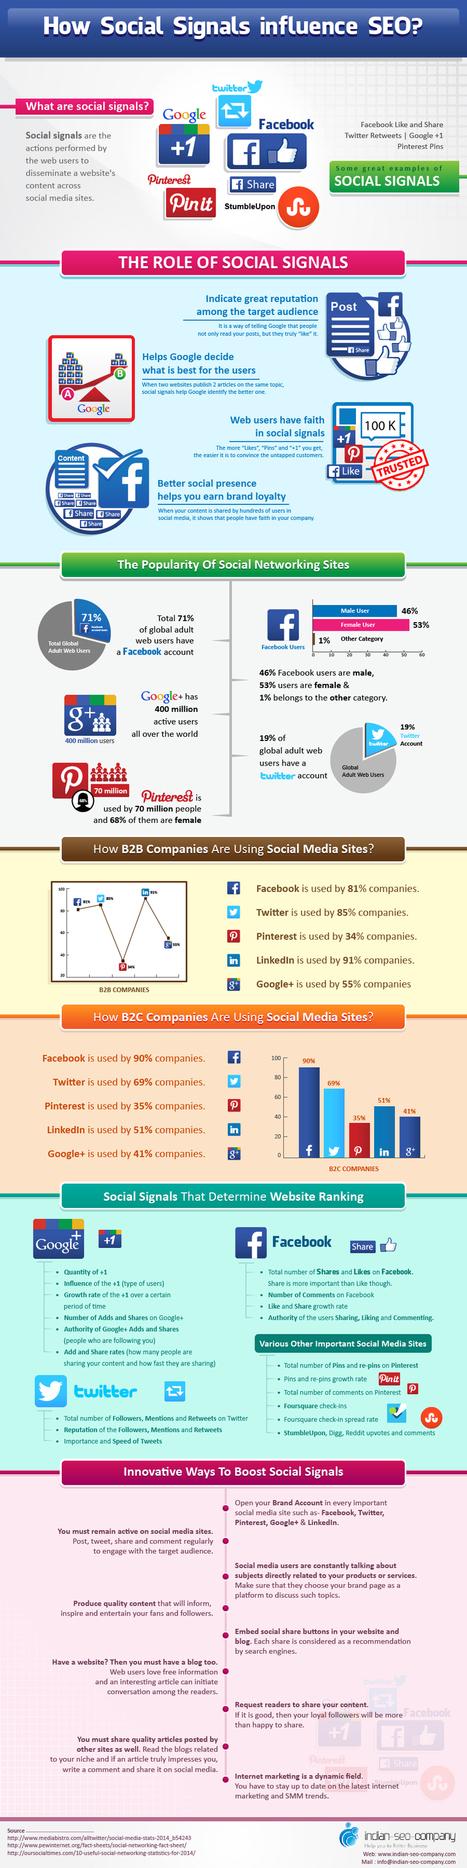 How do Social Signals Impact SEO? [Infographic] - SocialTimes | #DATA | Scoop.it